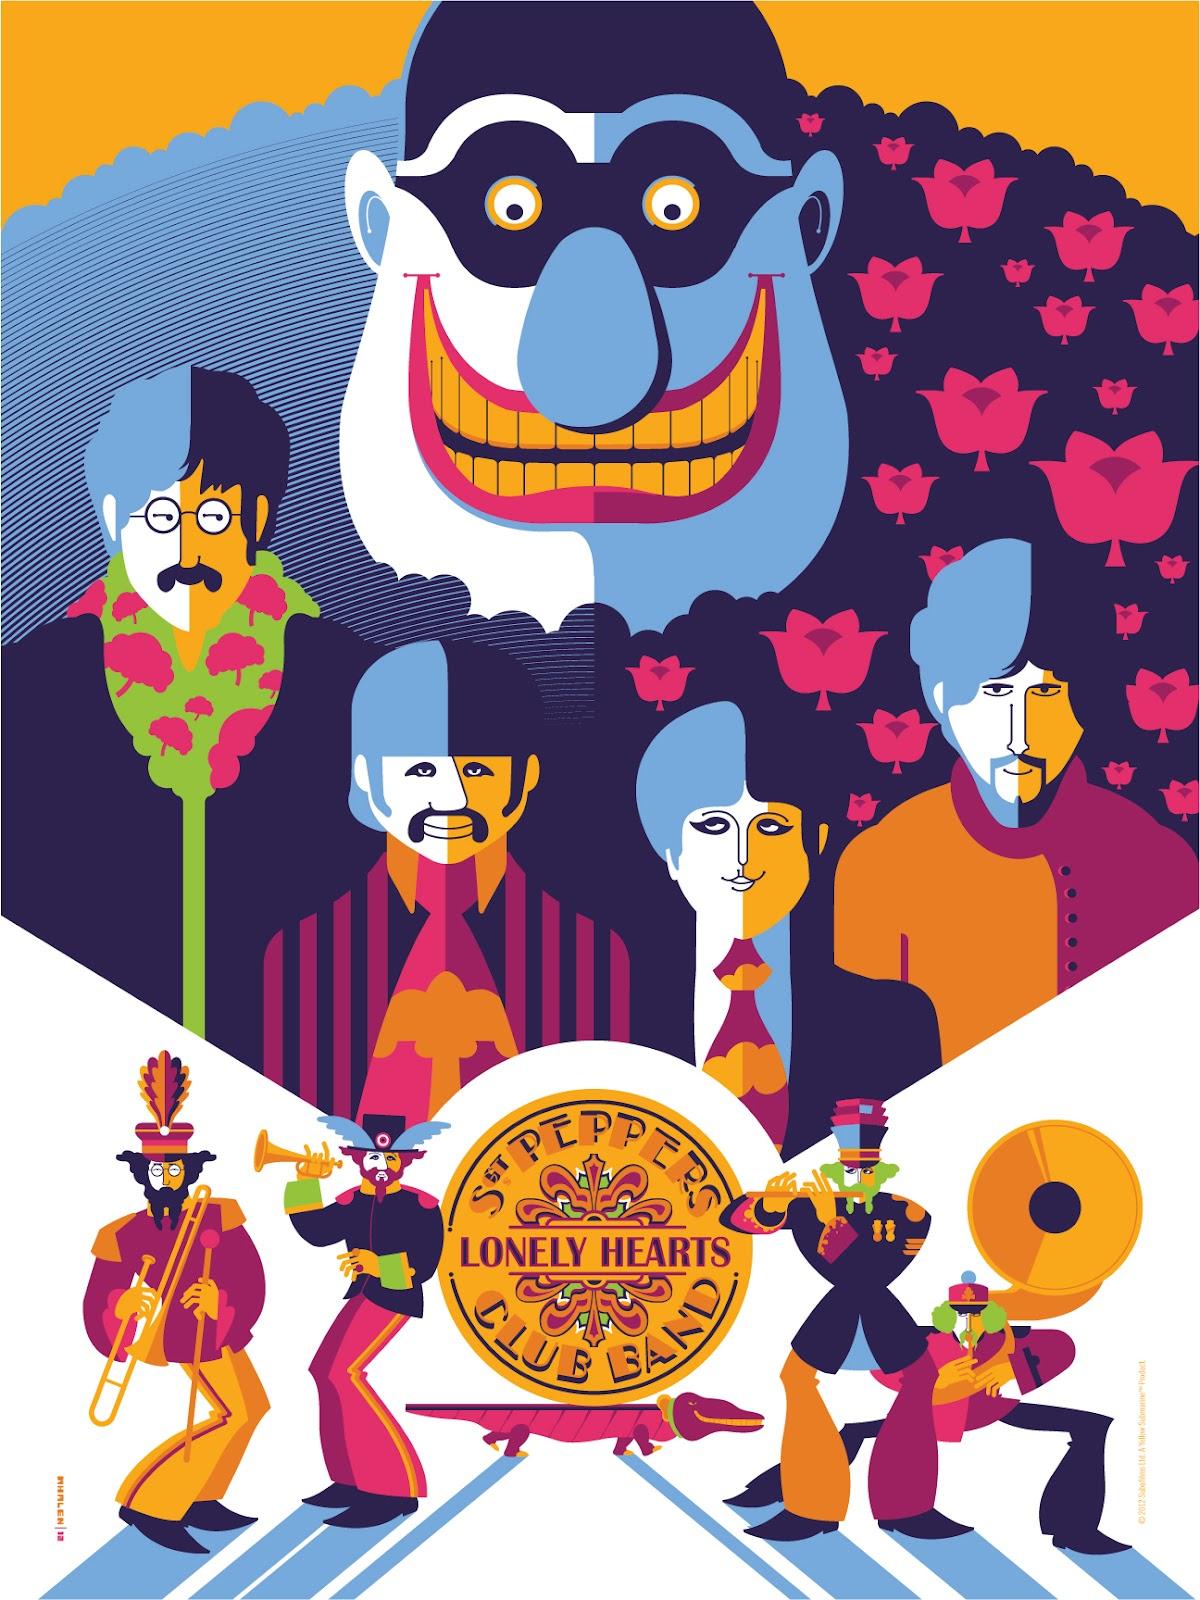 Inside The Rock Poster Frame Blog Tom Whalen Yellow